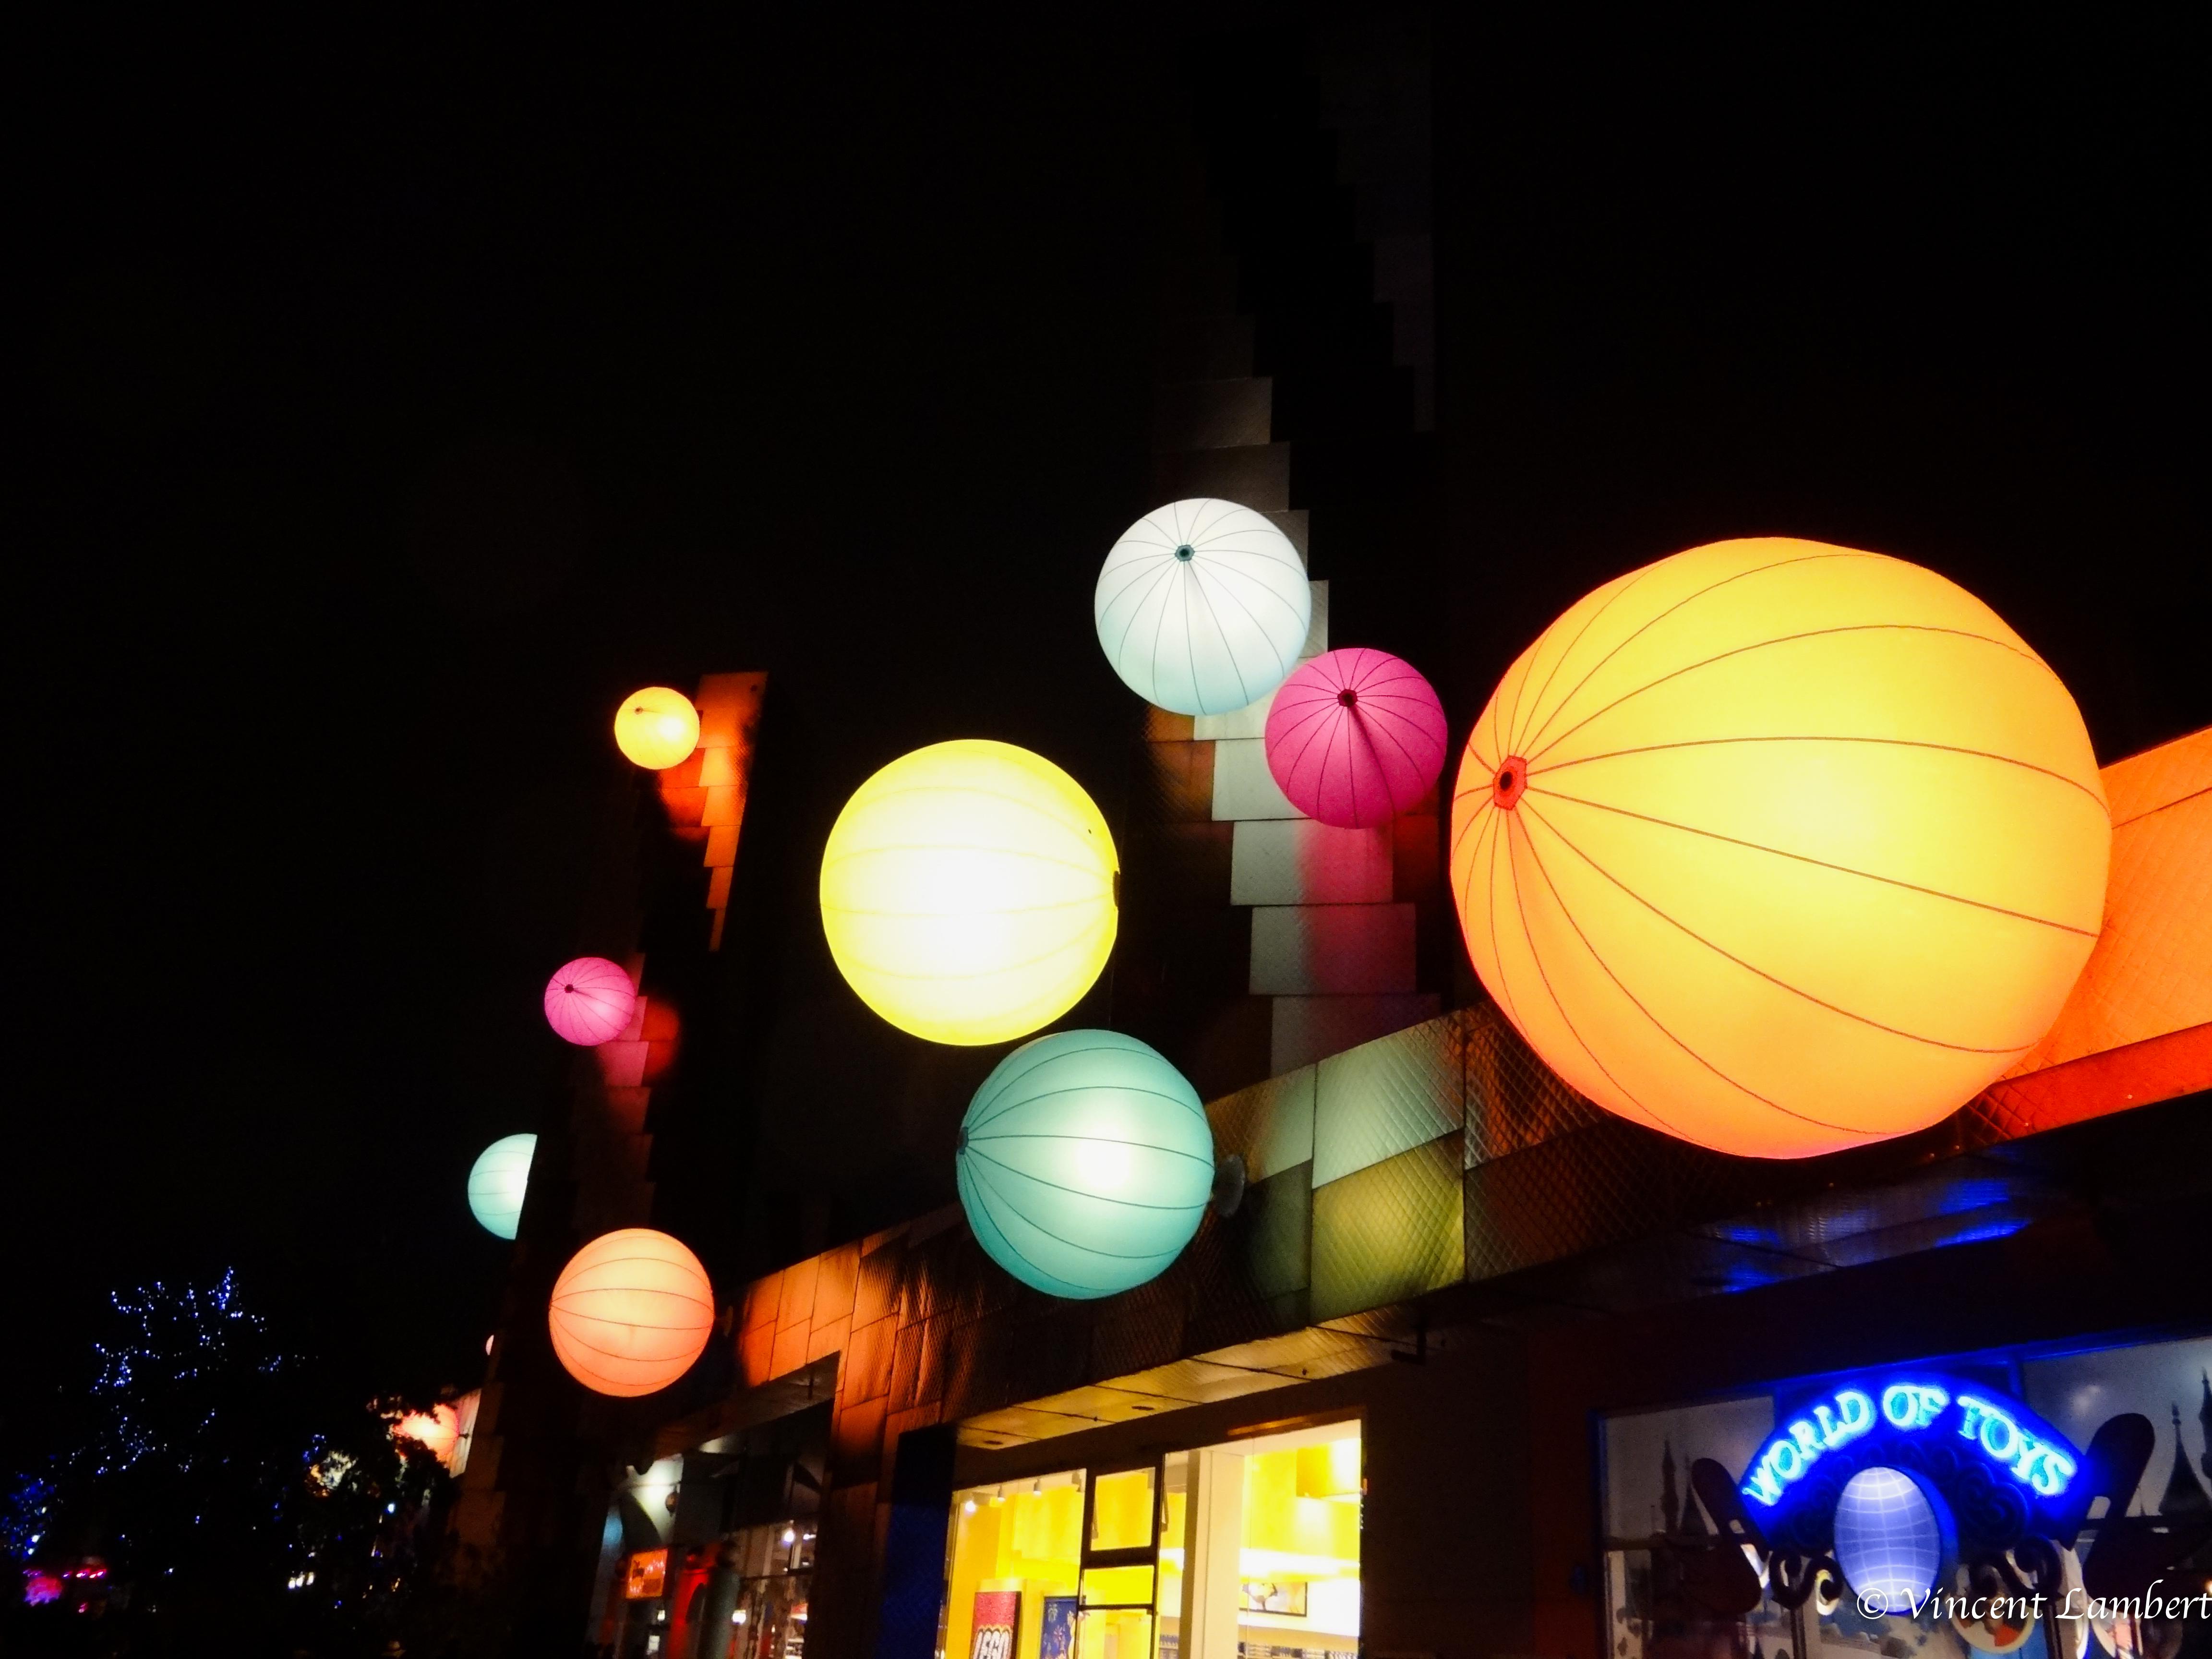 Ballonnen Met Licht : Hintergrundbilder nacht beleuchtung licht ballon laterne